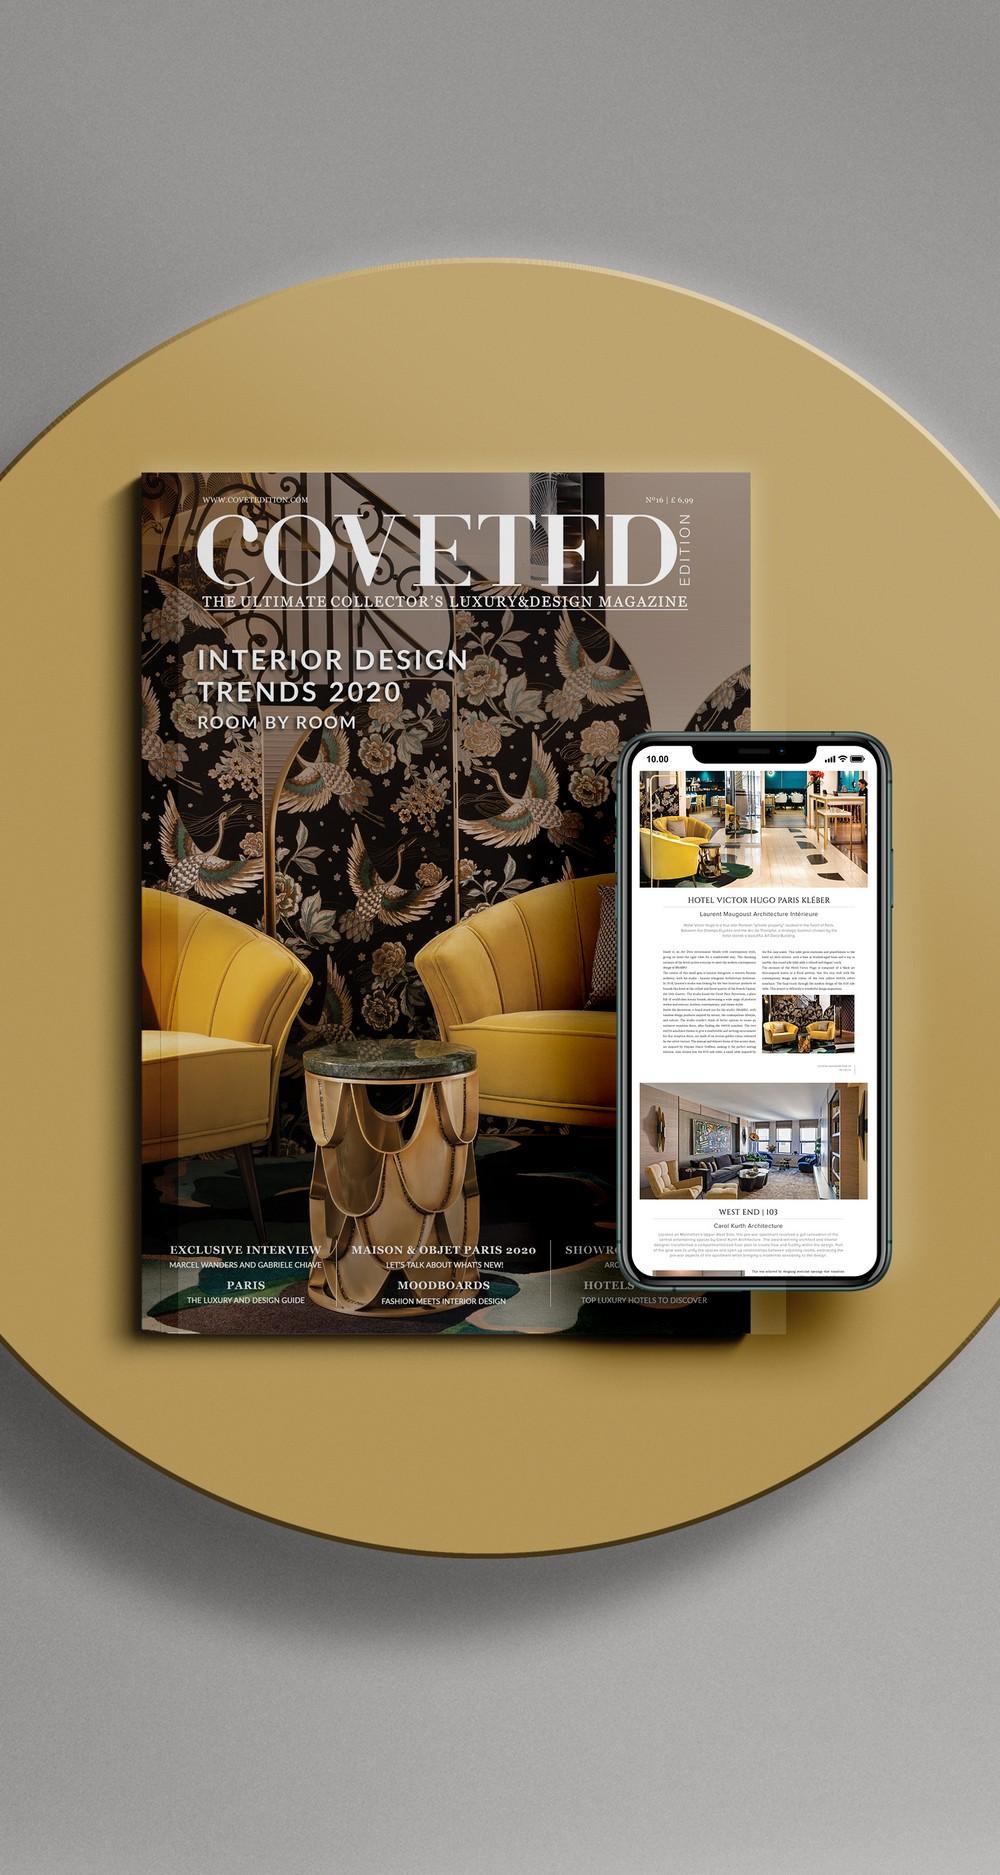 5 Interior Design Magazines You Must Read This Month! interior design 5 Interior Design Magazines You Must Read This Month! 5 Interior Design Magazines You Must Read This Month 5